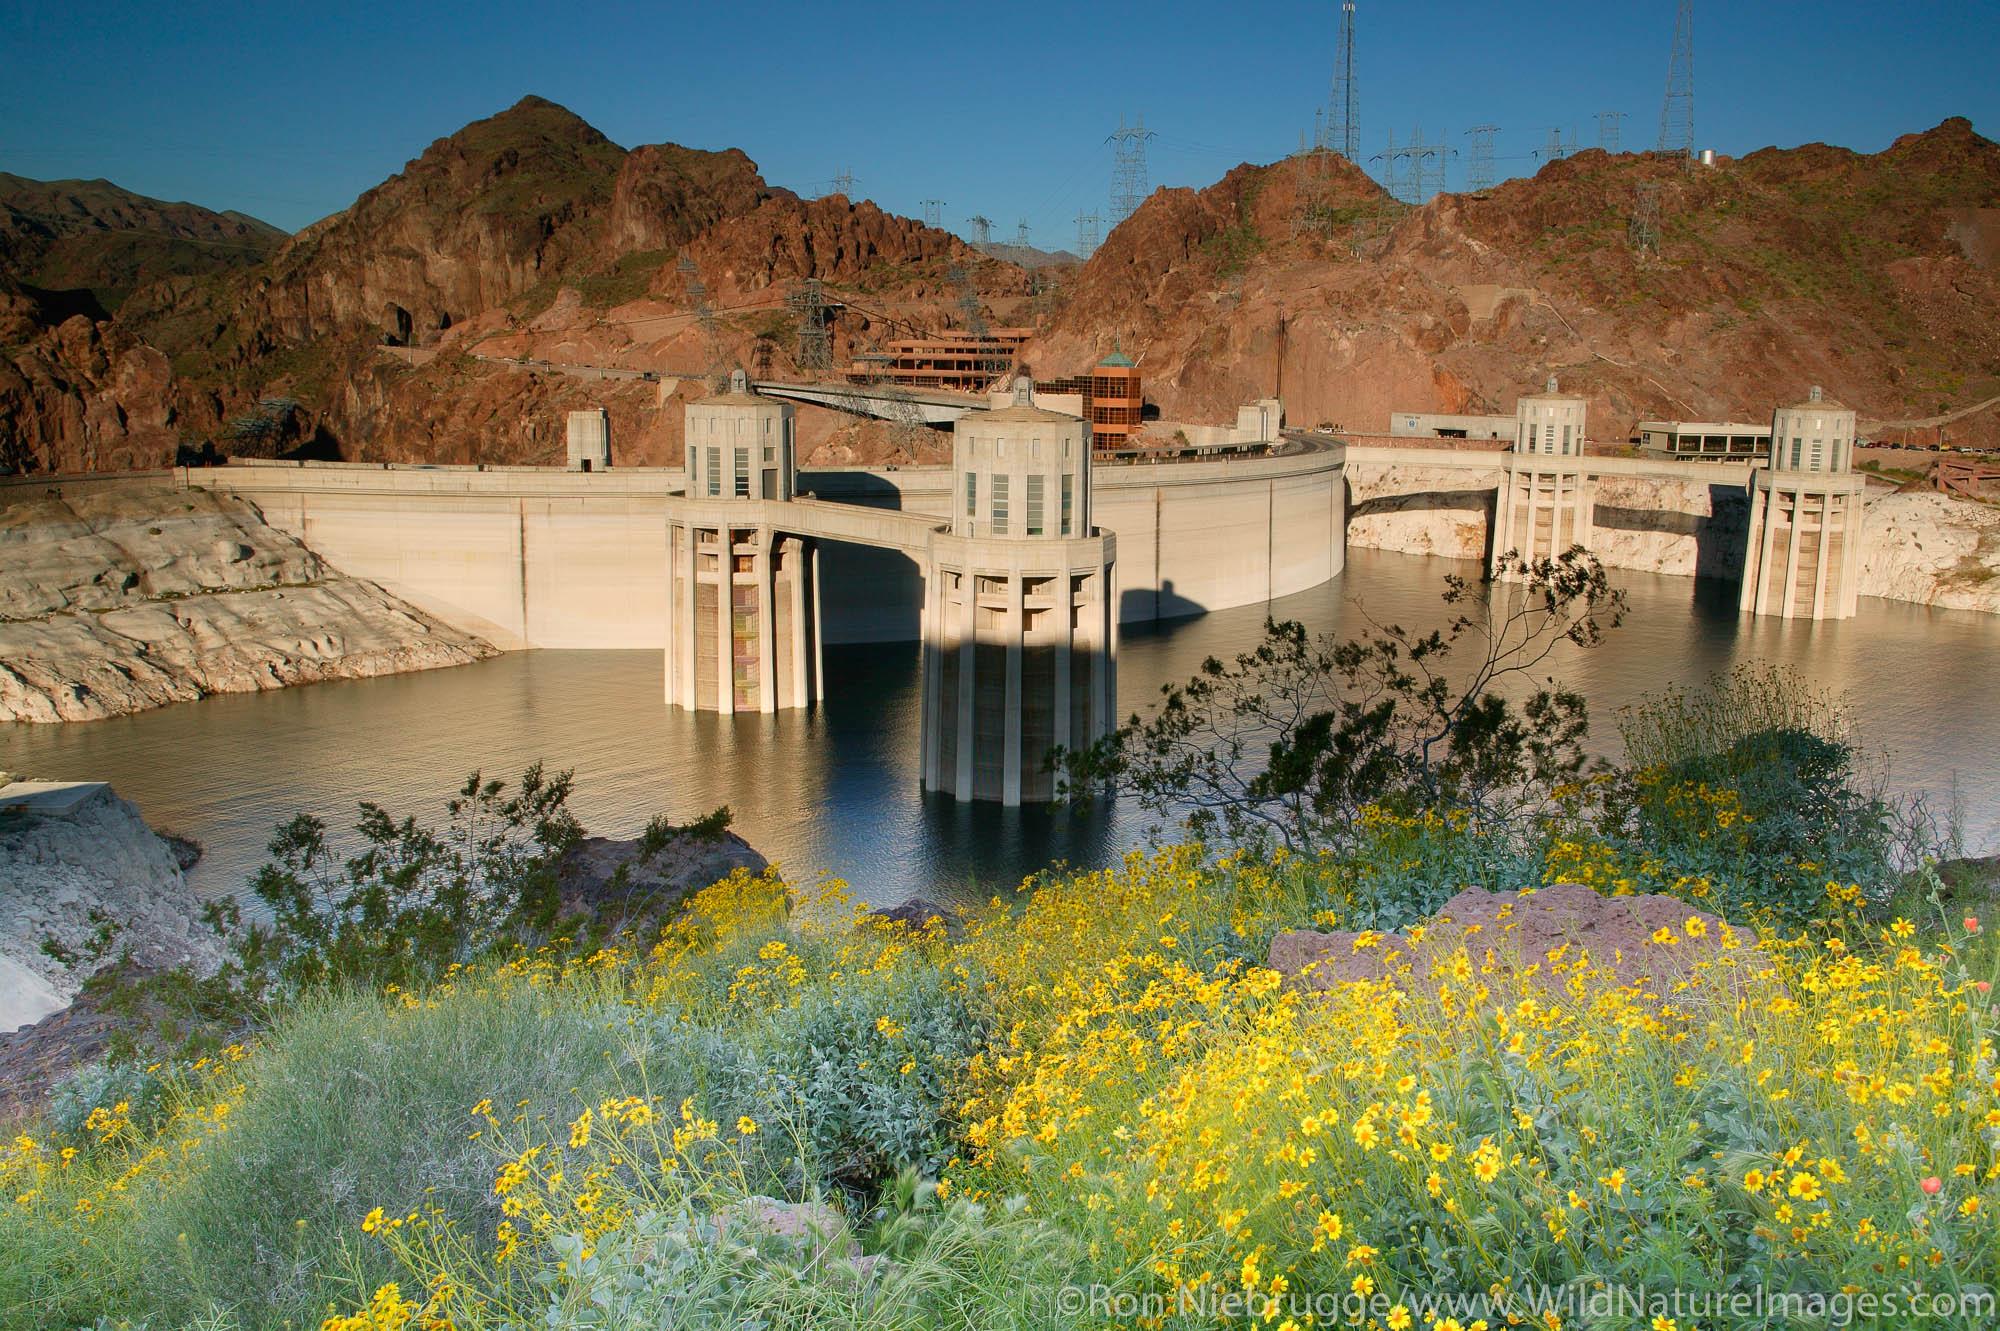 Hoover Dam, Lake Mead Recreation Area, looking towards Nevada from Arizona.